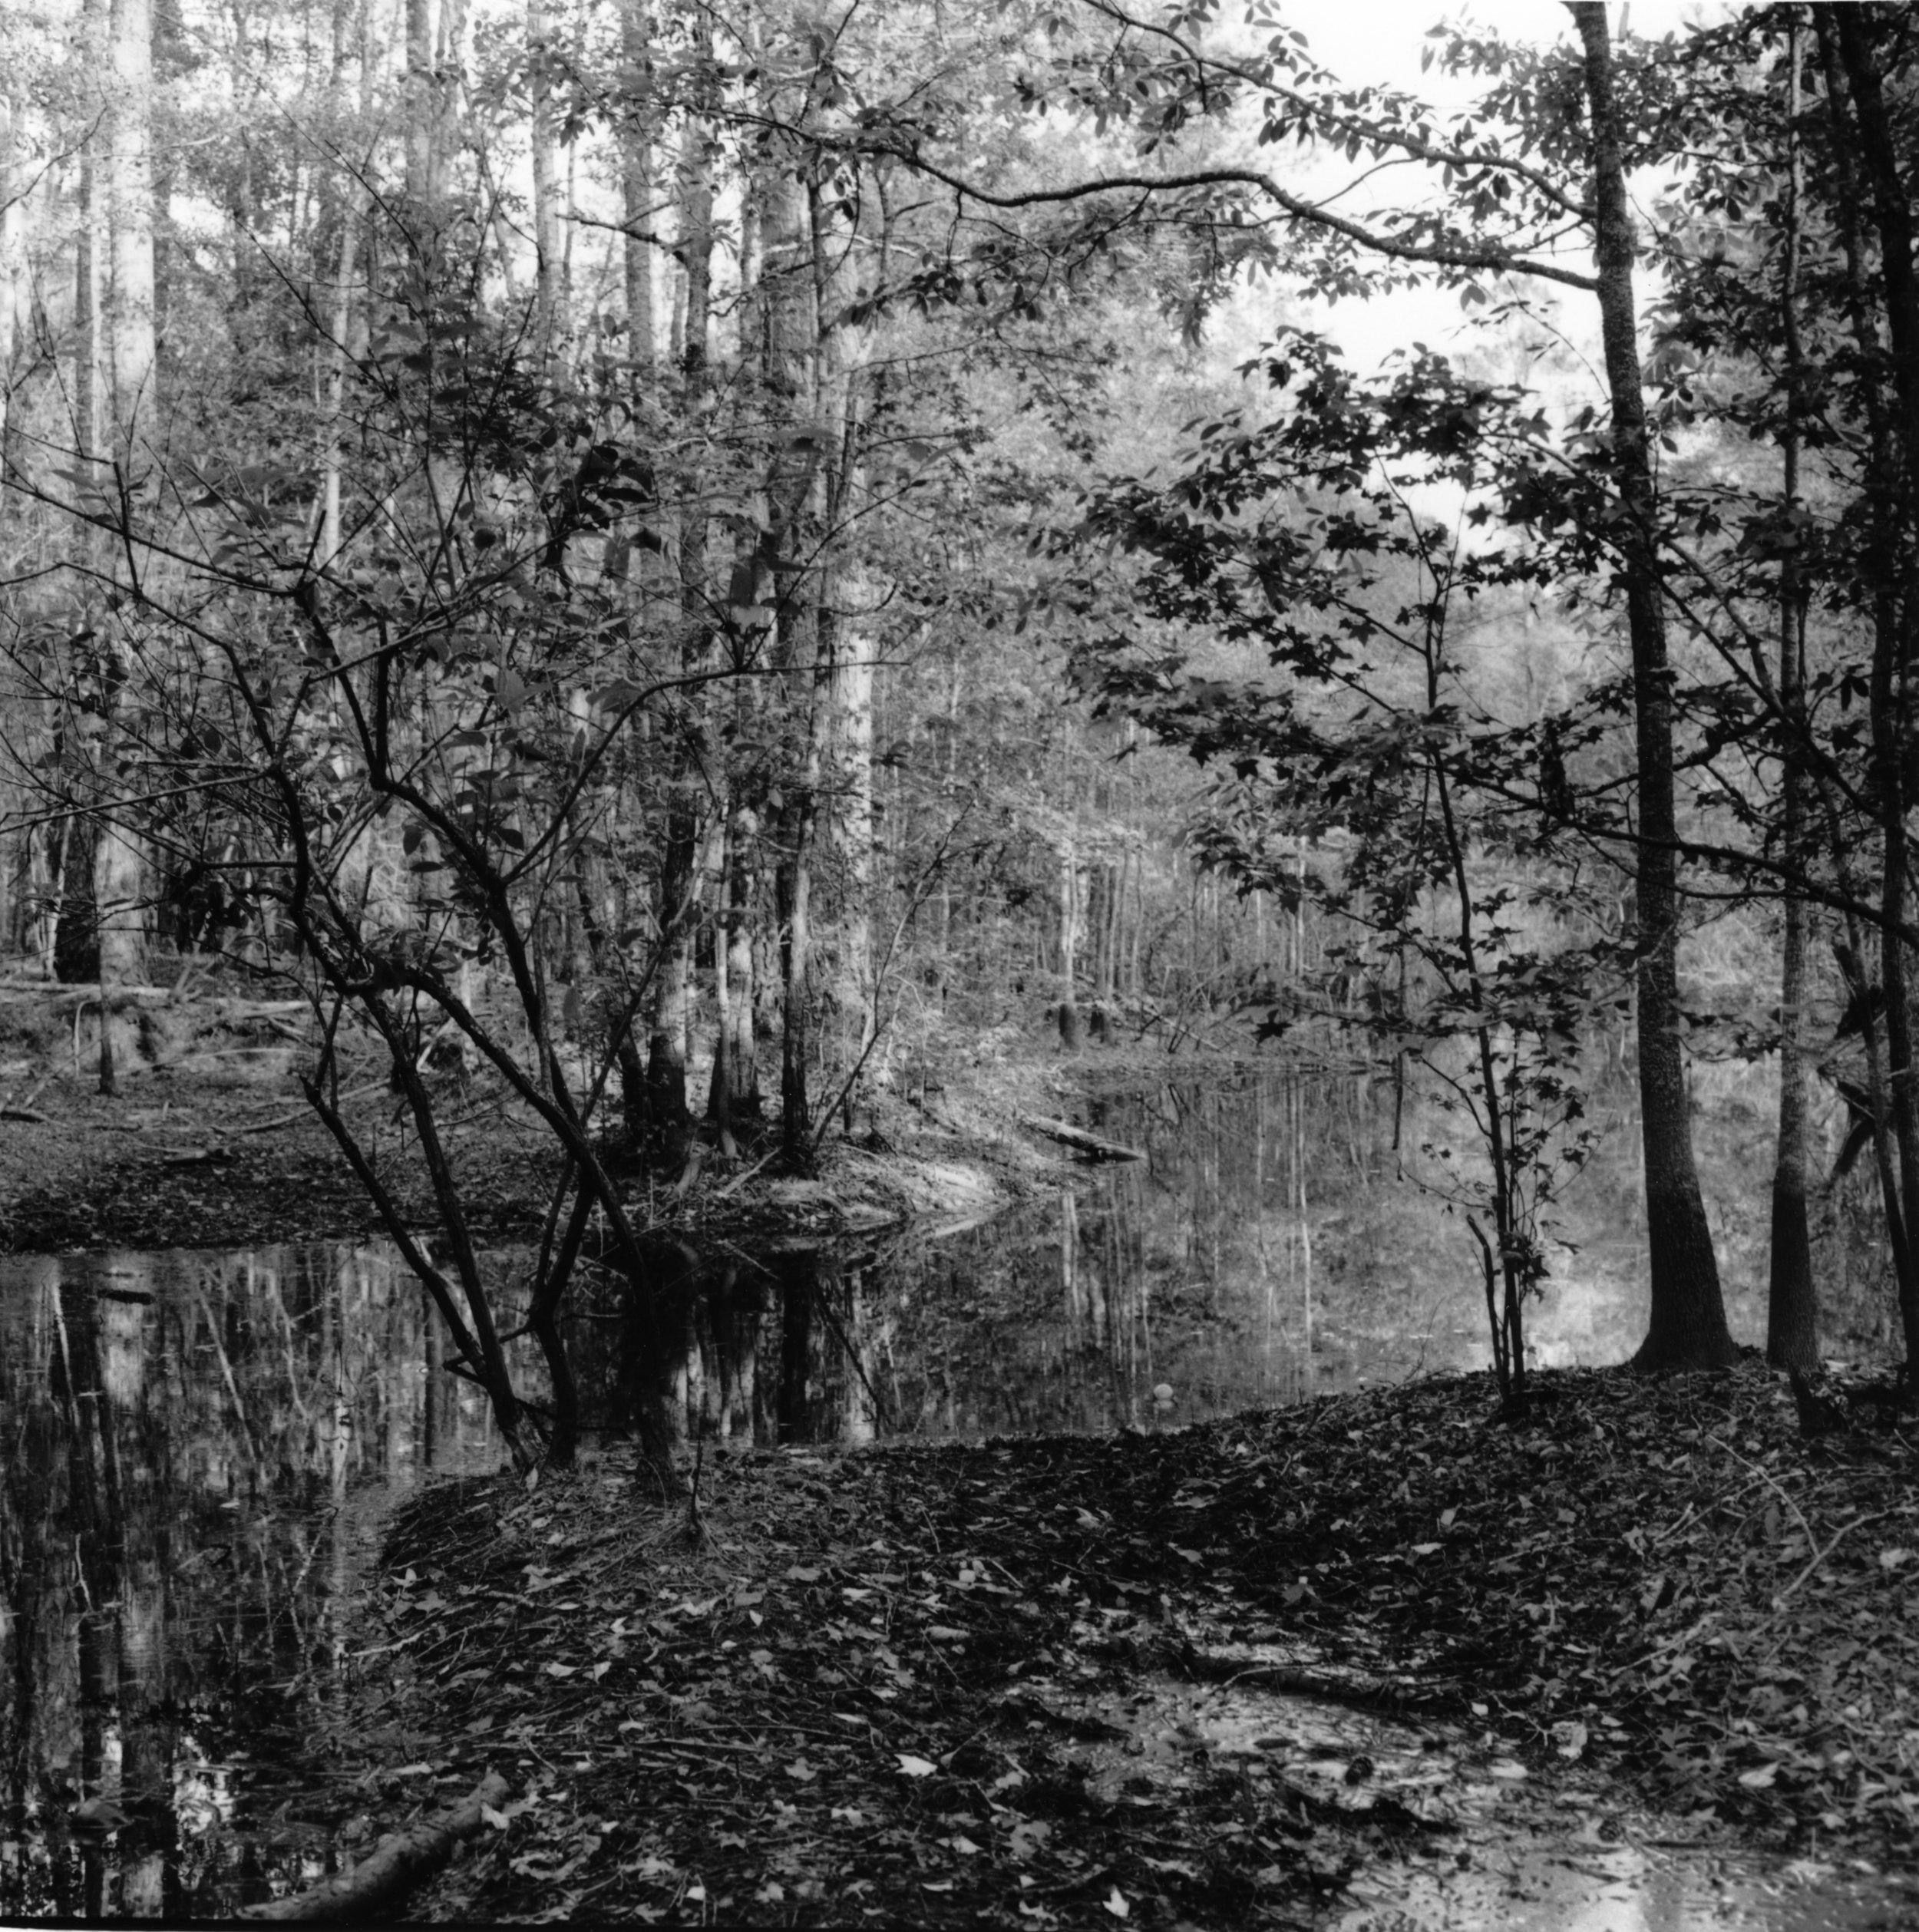 Honey Hill Battle Site, South Carolina, 1999